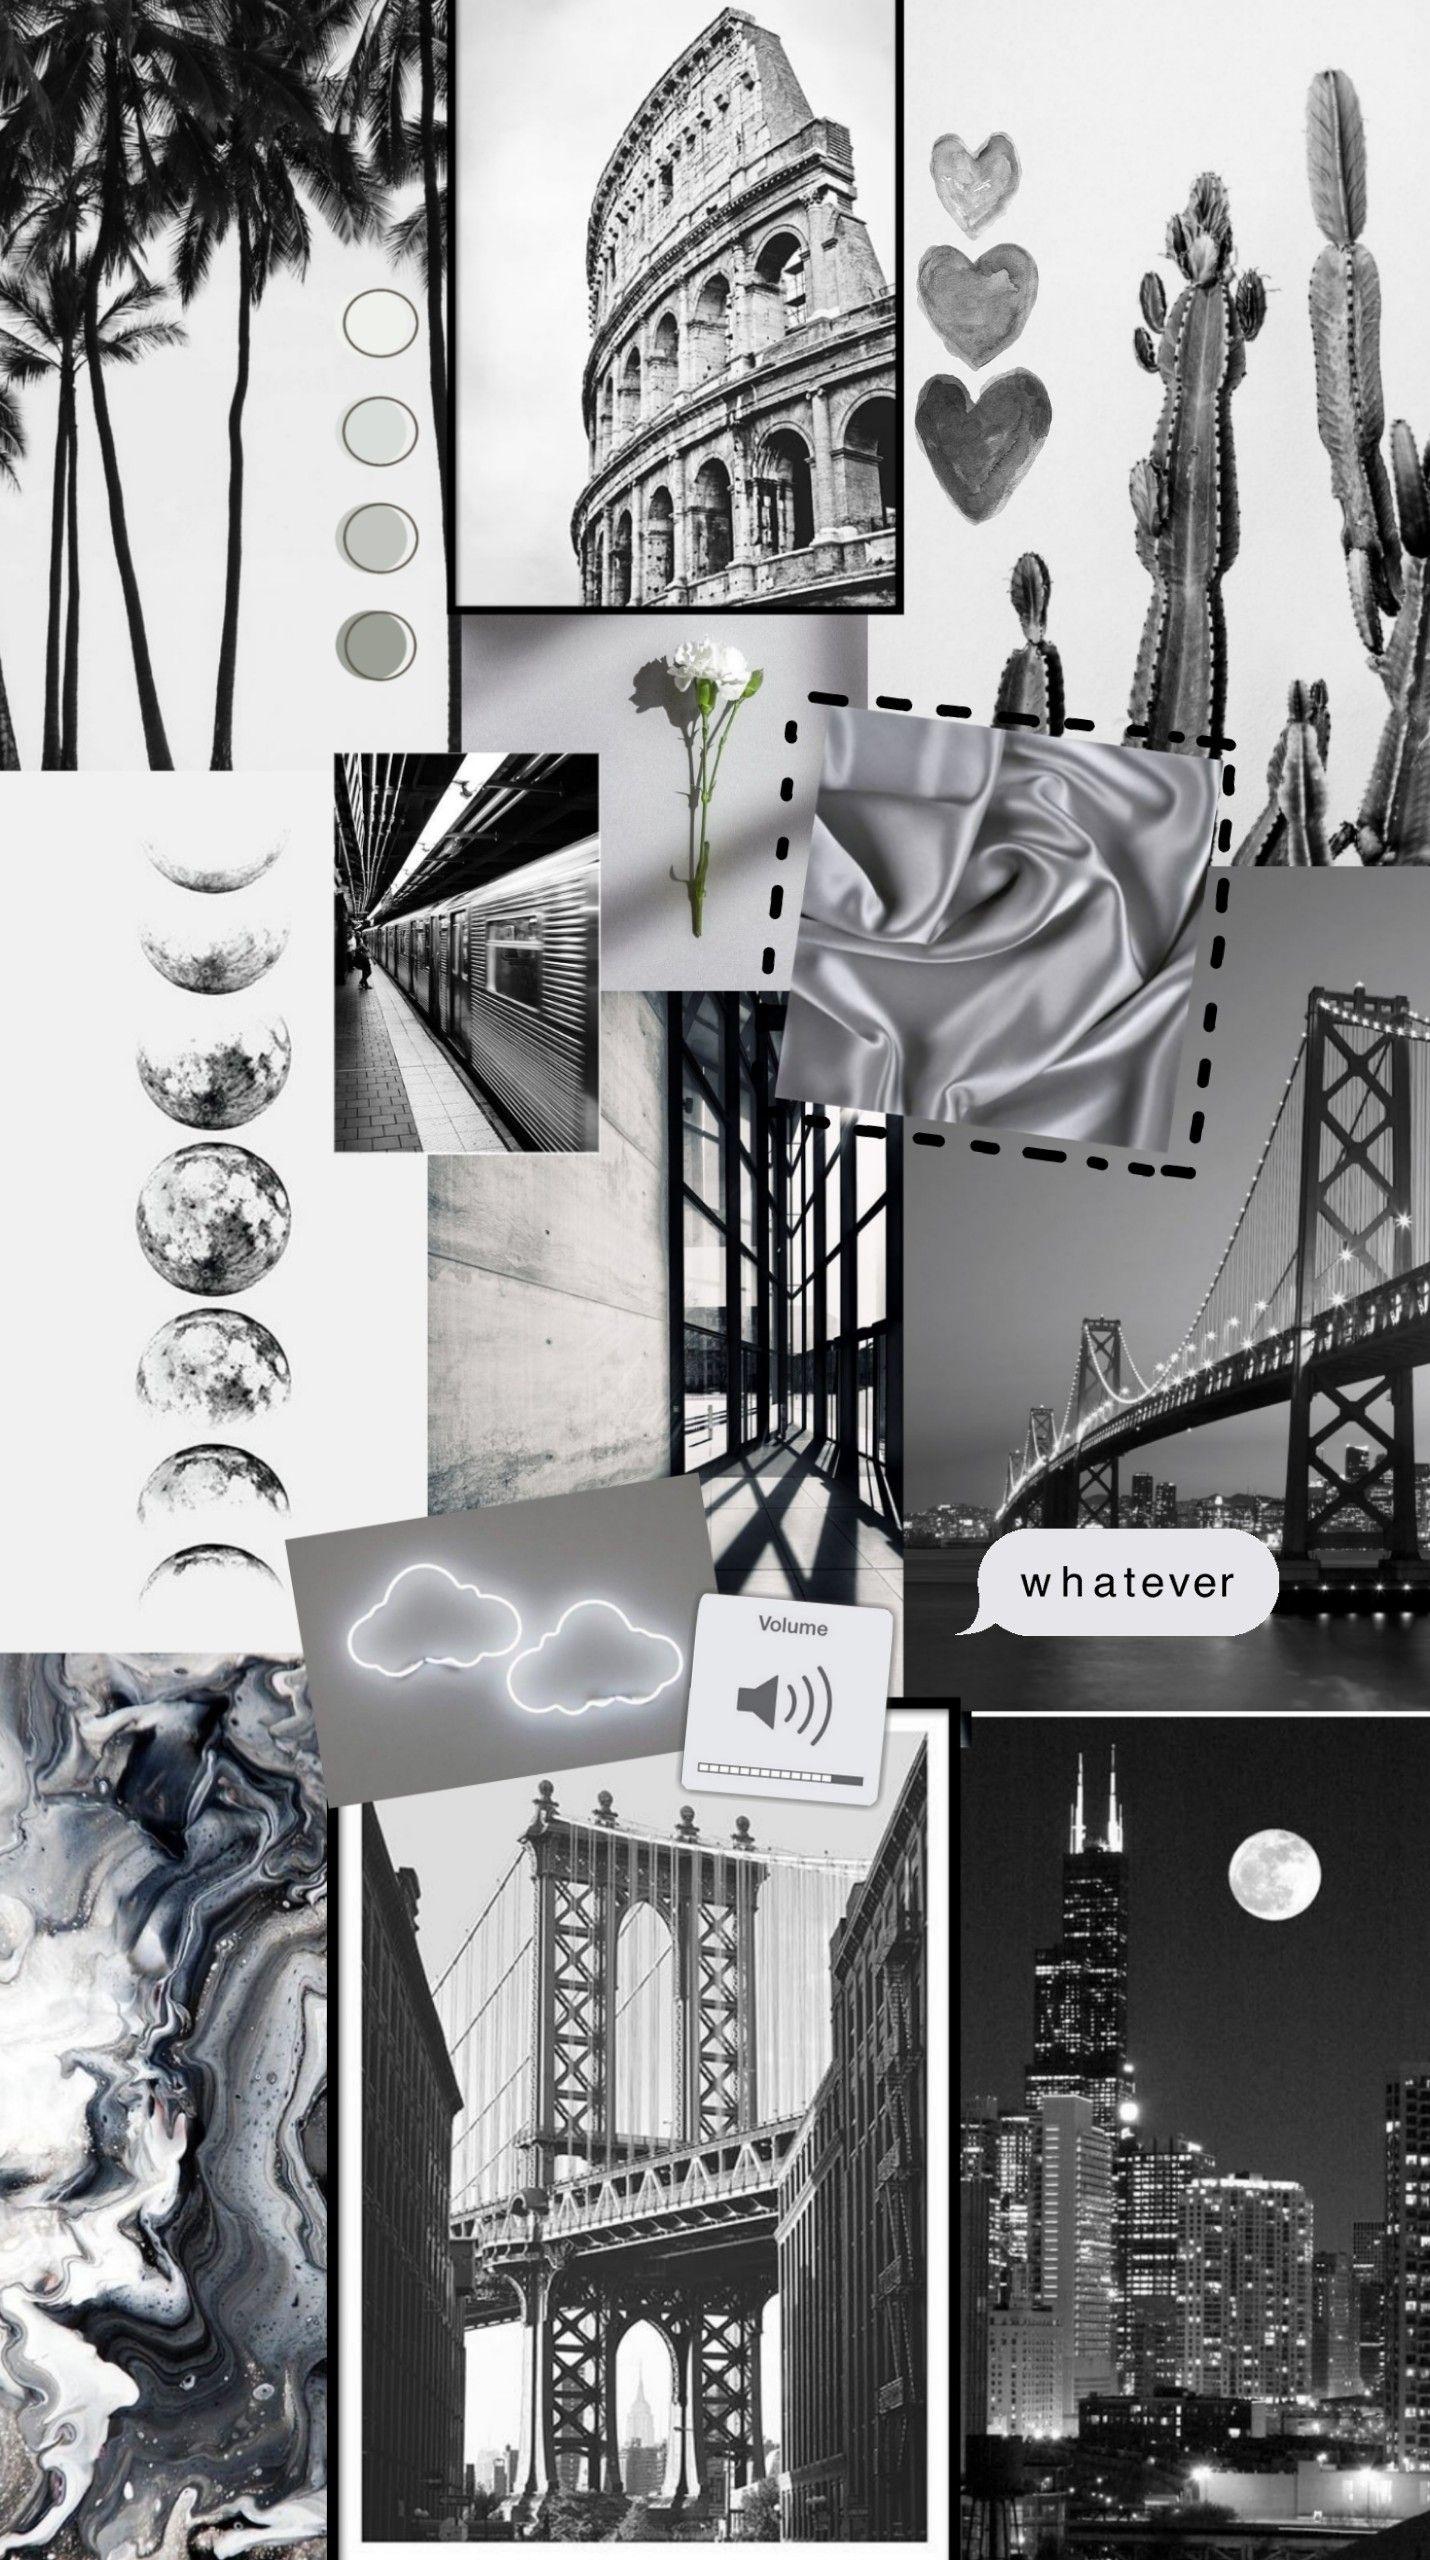 Grey Sky In 2020 Cute Tumblr Wallpaper Colourful Wallpaper Iphone Wallpaper Iphone Boho